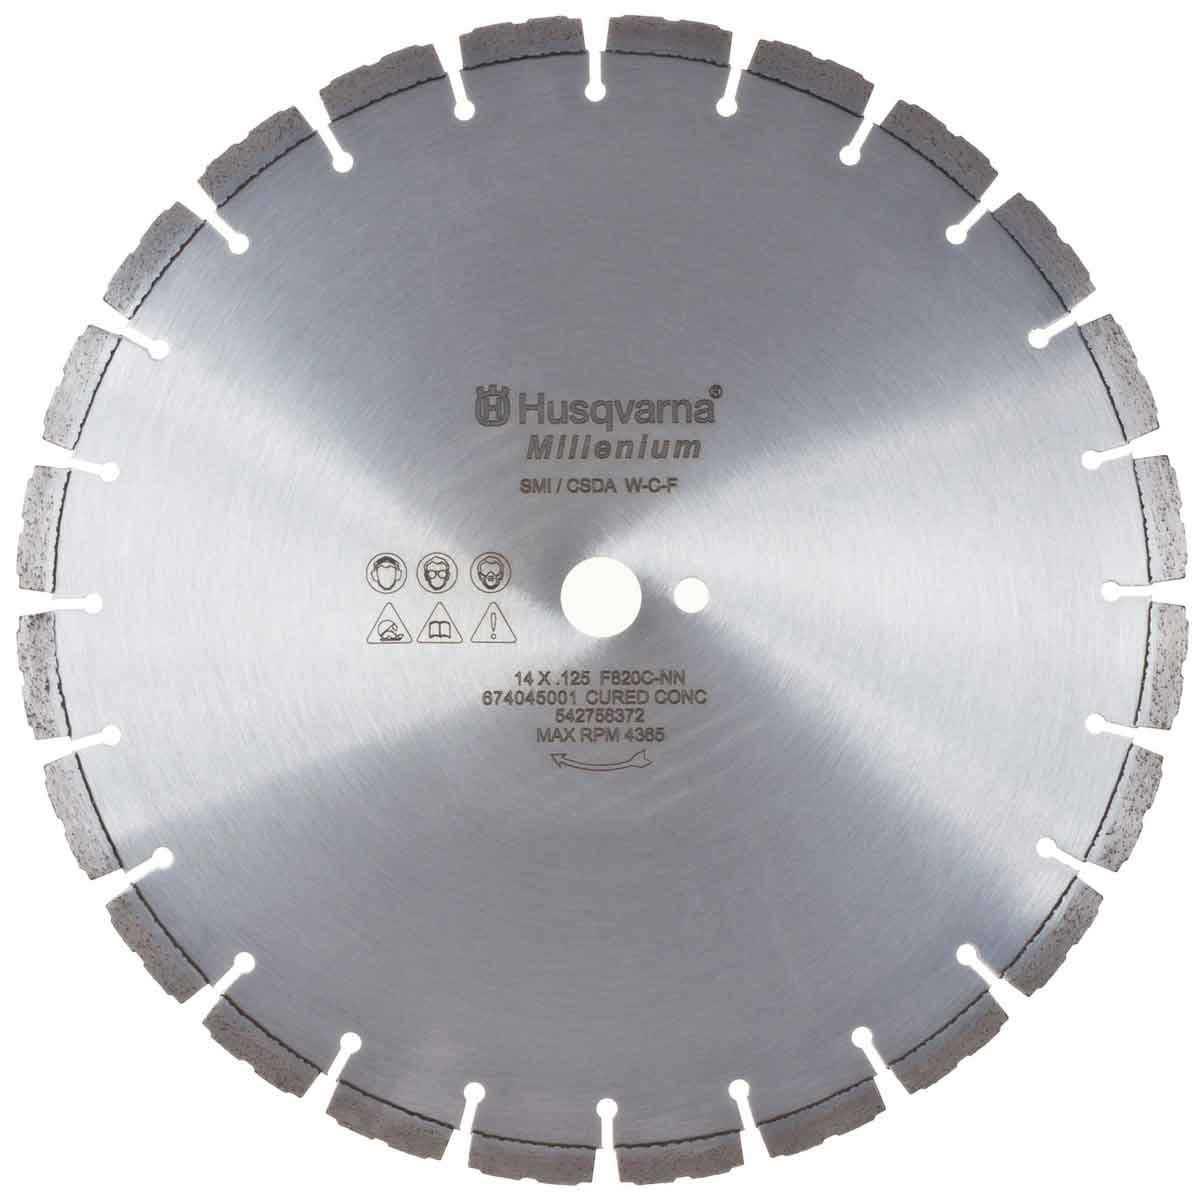 Husqvarna Millenium F820C Diamond Blades